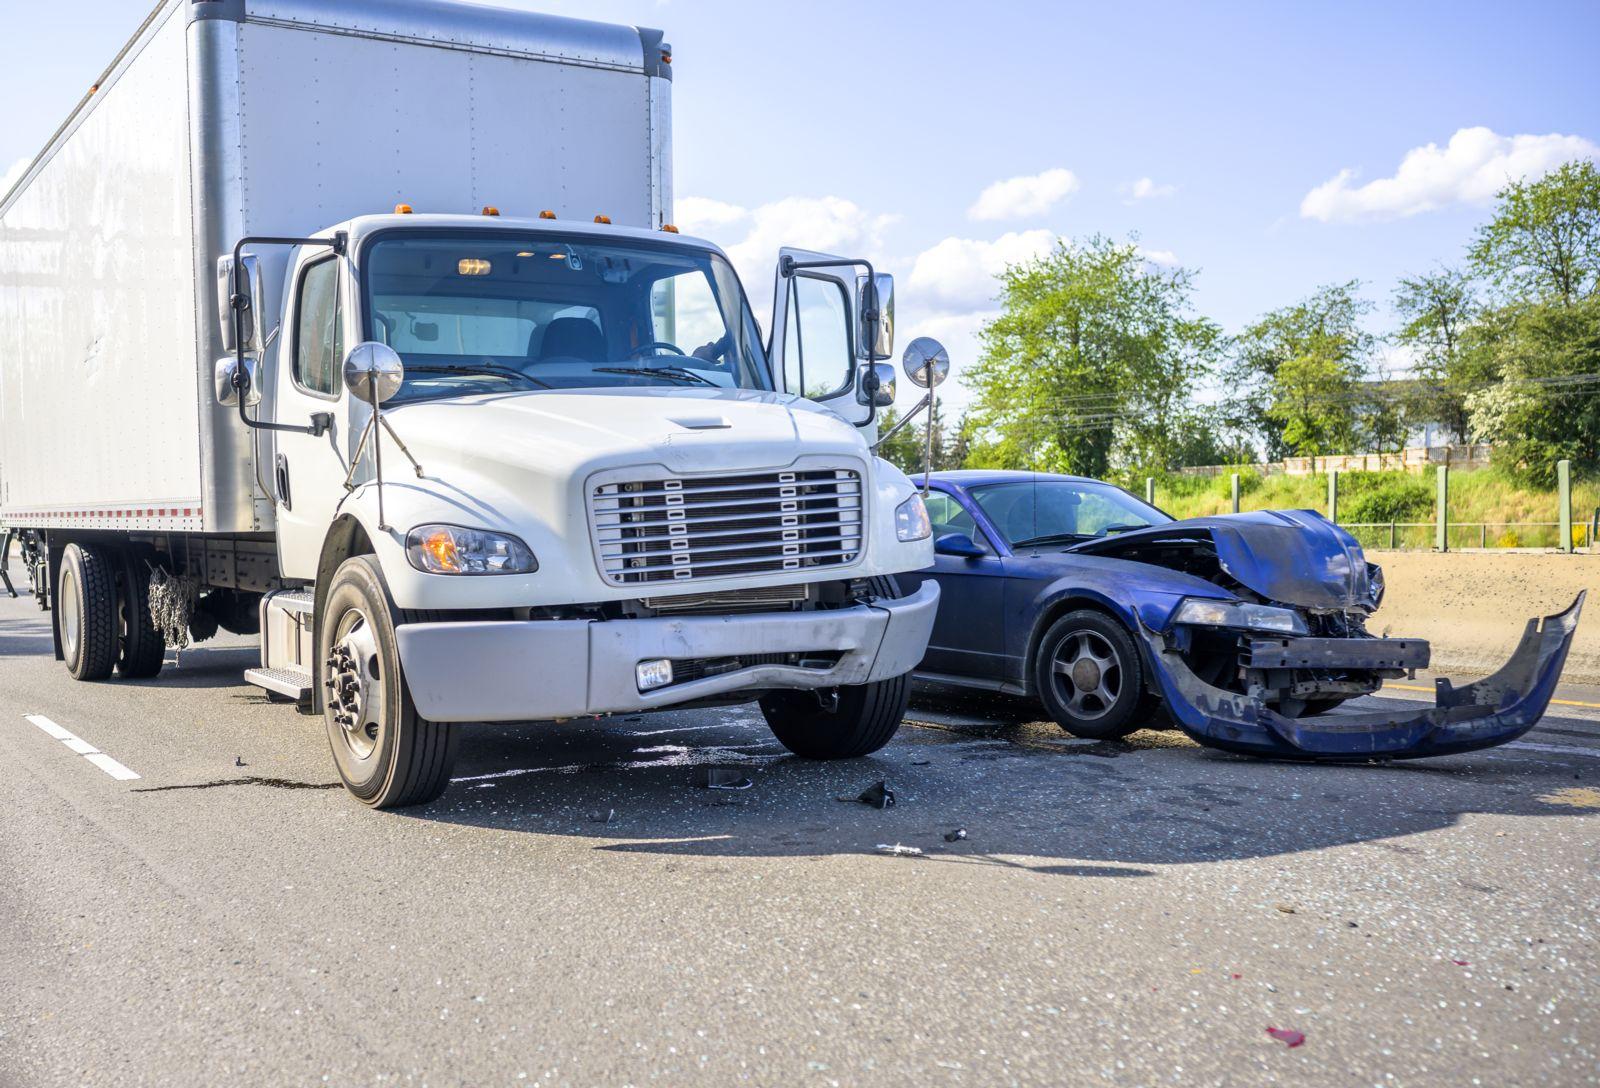 Louisiana Truck Accident Lawyer Flattmann Law